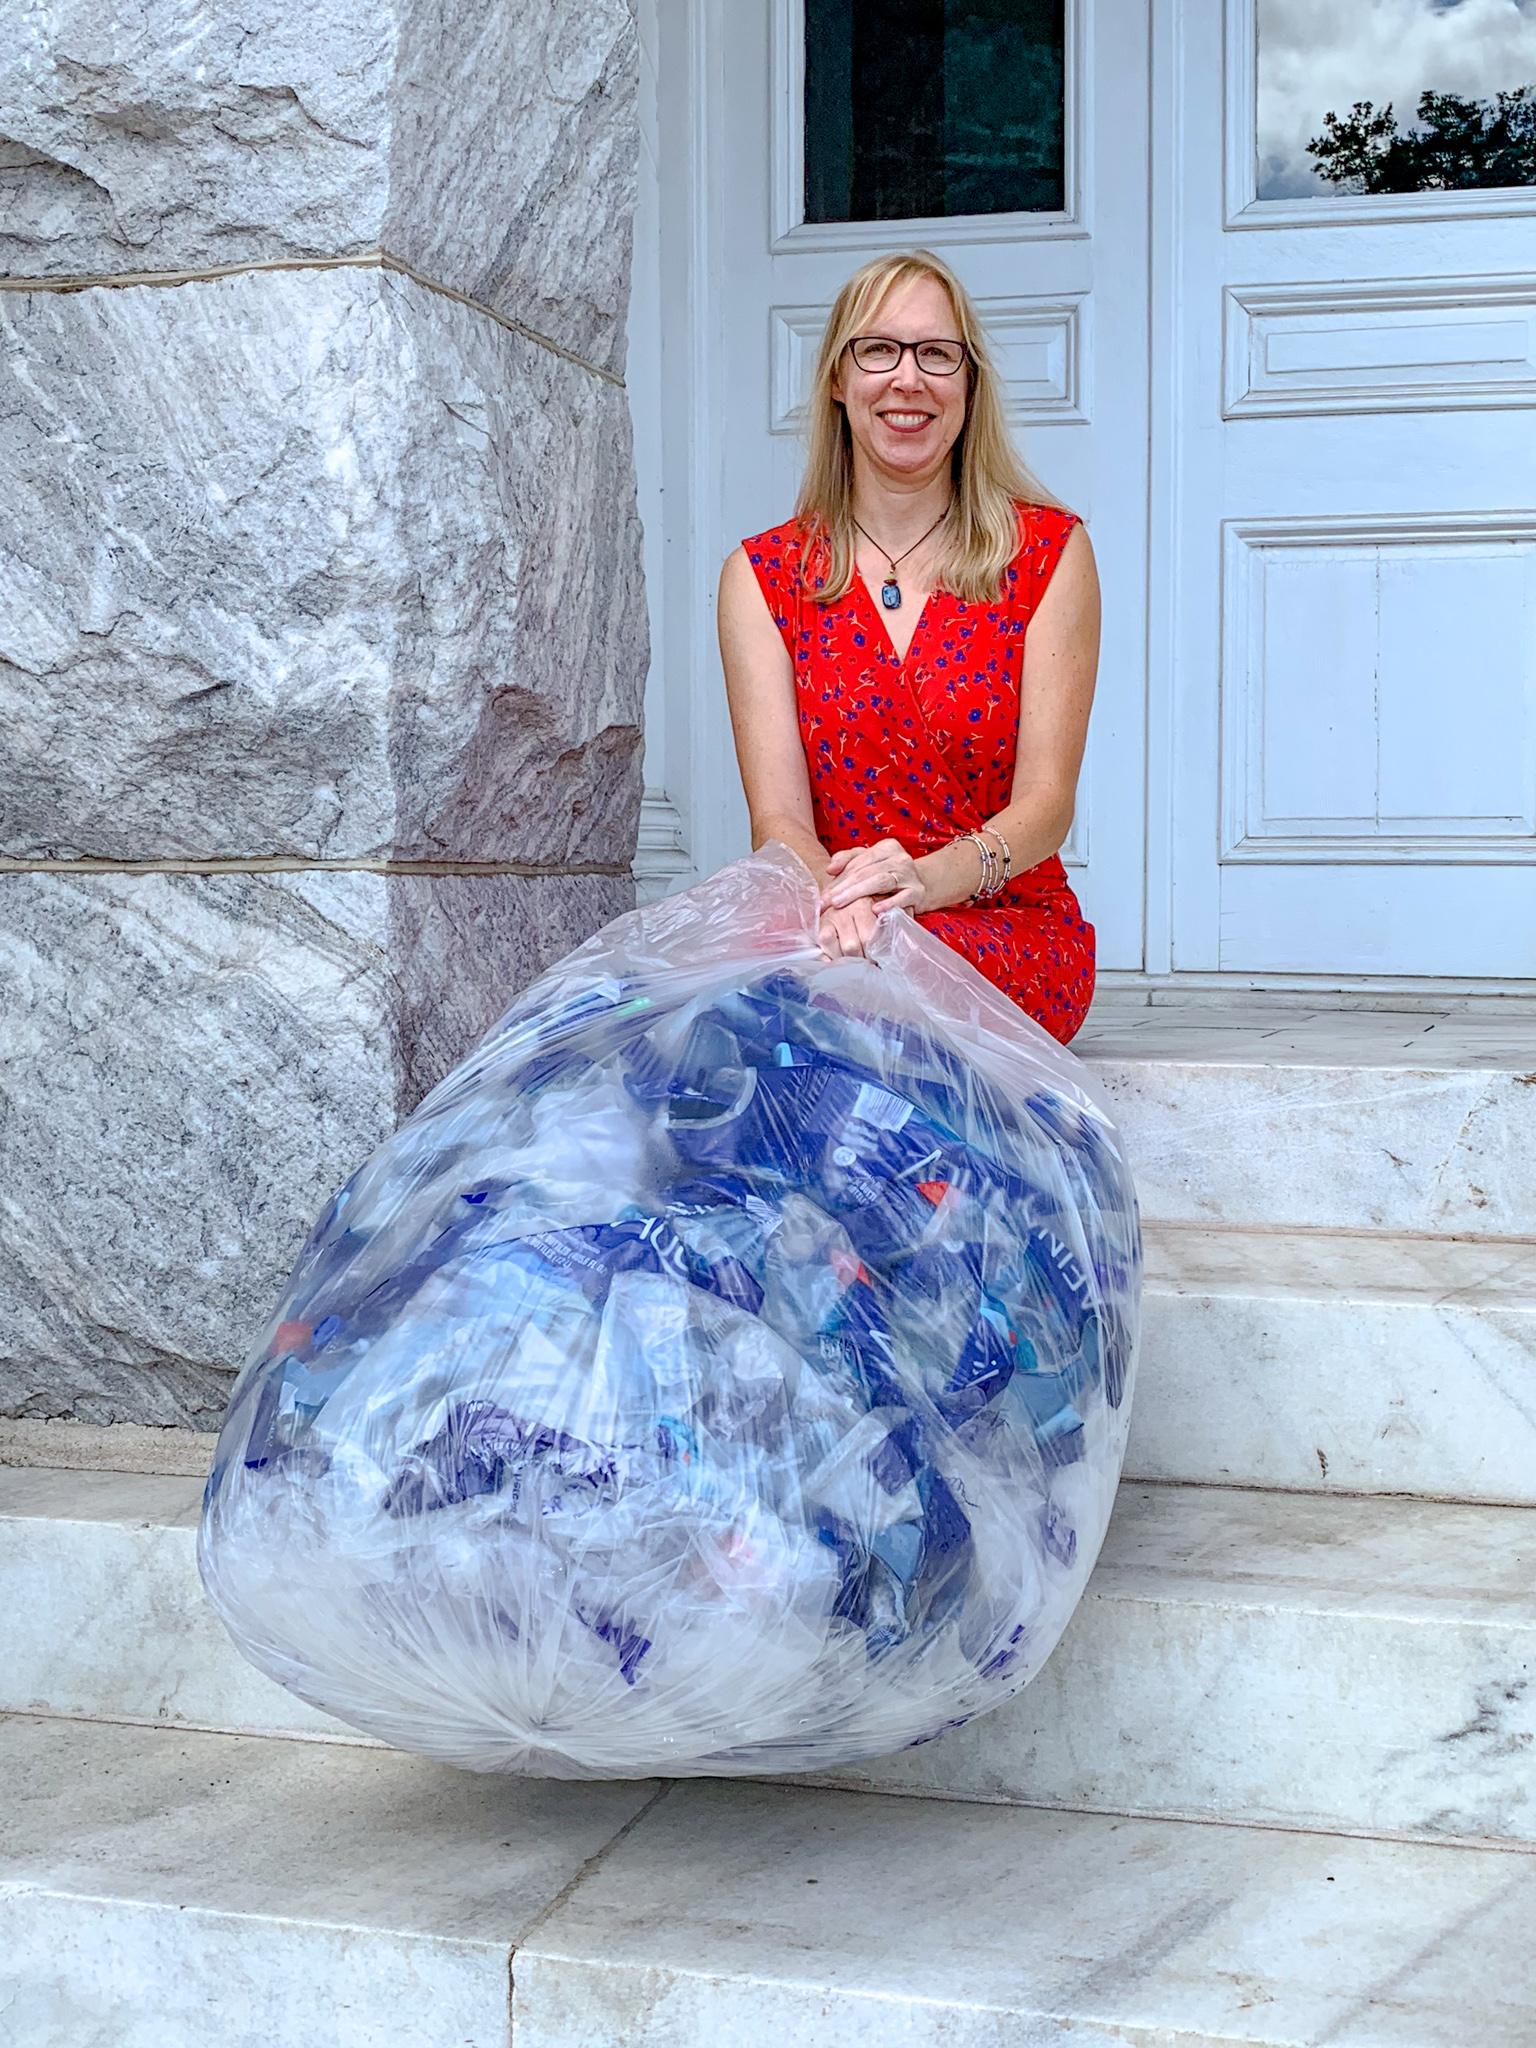 Christy Trowbridge of Keep Golden Isles Beautiful promoting plastics recycling.